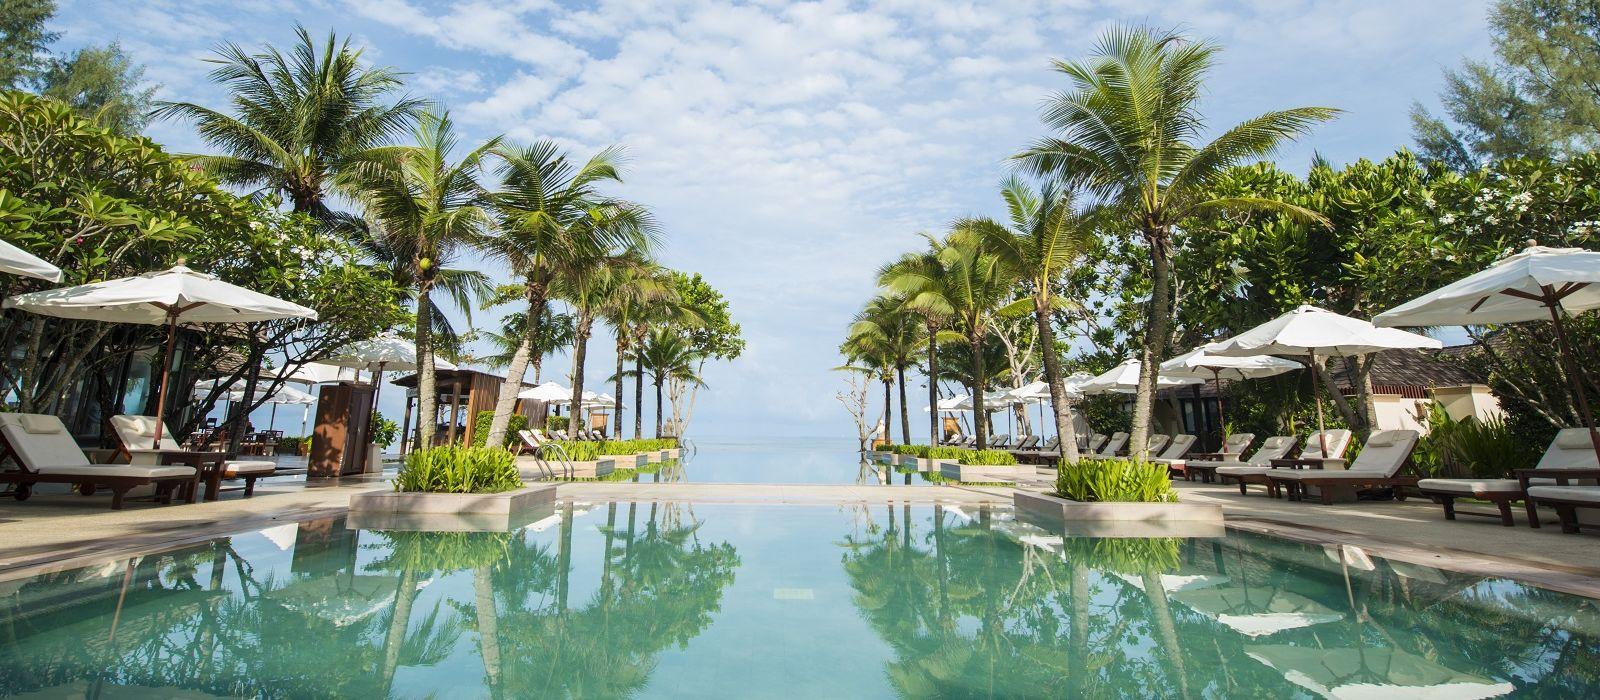 Hotel Layana Resort & Spa Thailand